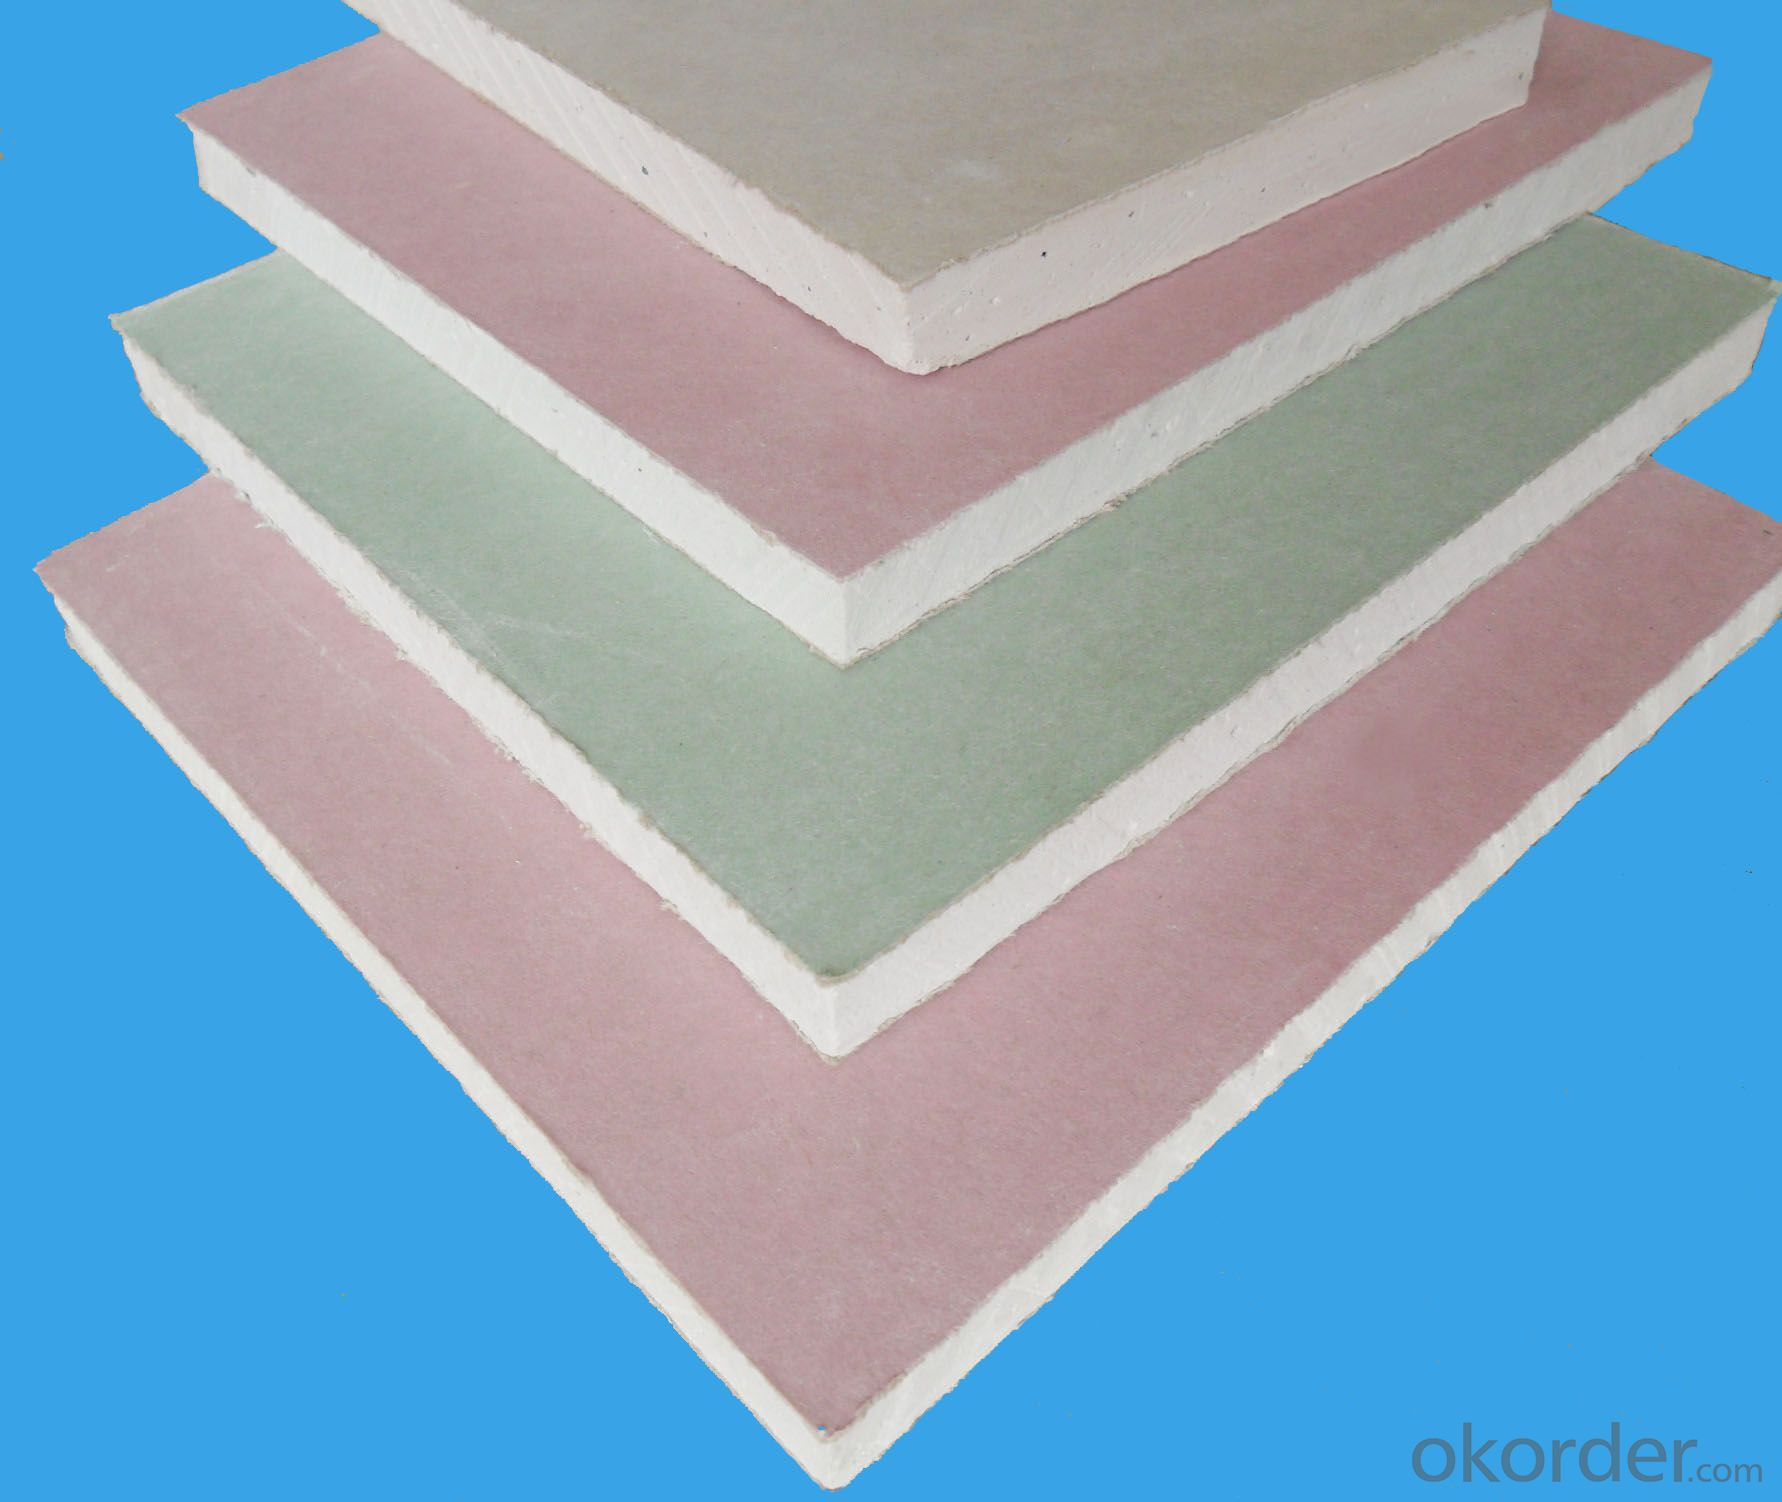 Gypsum Board Standard Size Australia Market